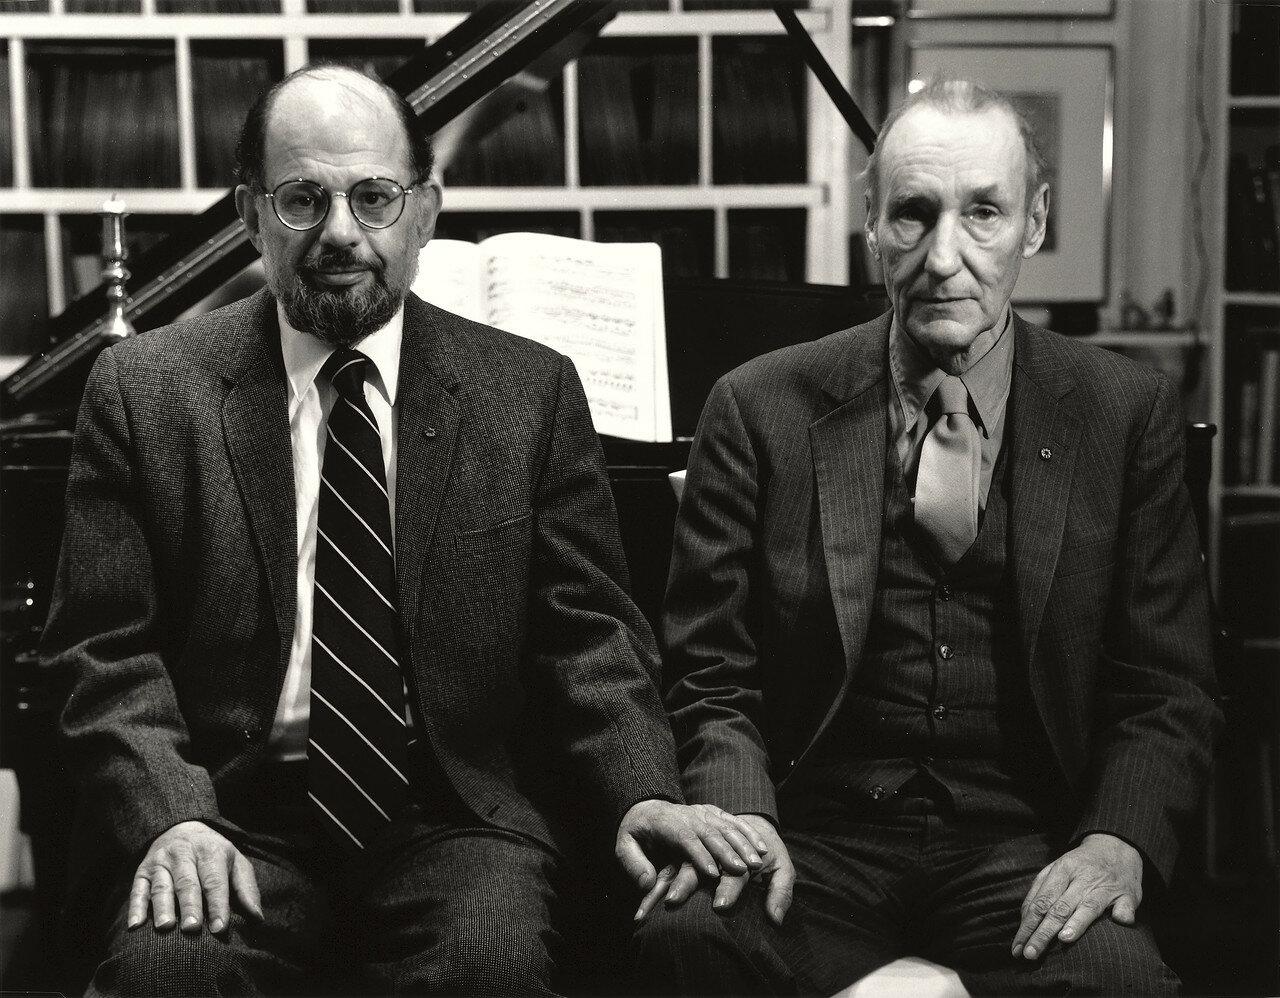 1984. Аллен Гинзберг (поэт) и Уильям Сьюард Берроуз (писатель)